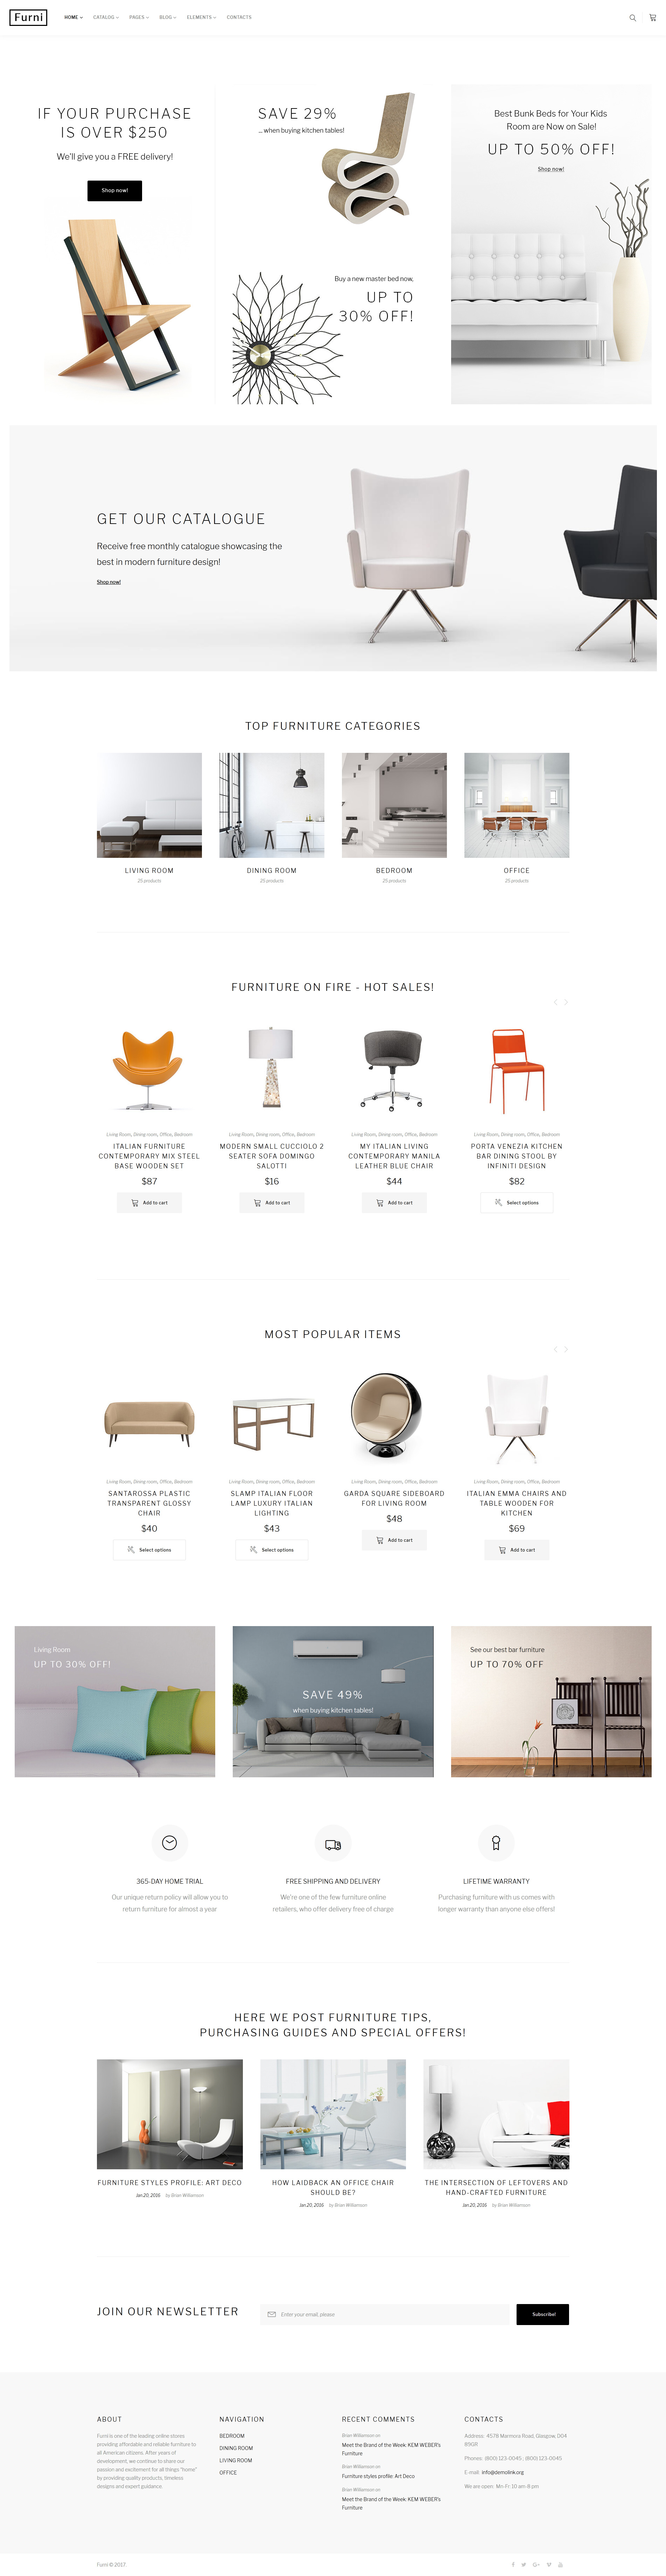 """Furni - Furniture Store Multipage"" 响应式网页模板 #62272"